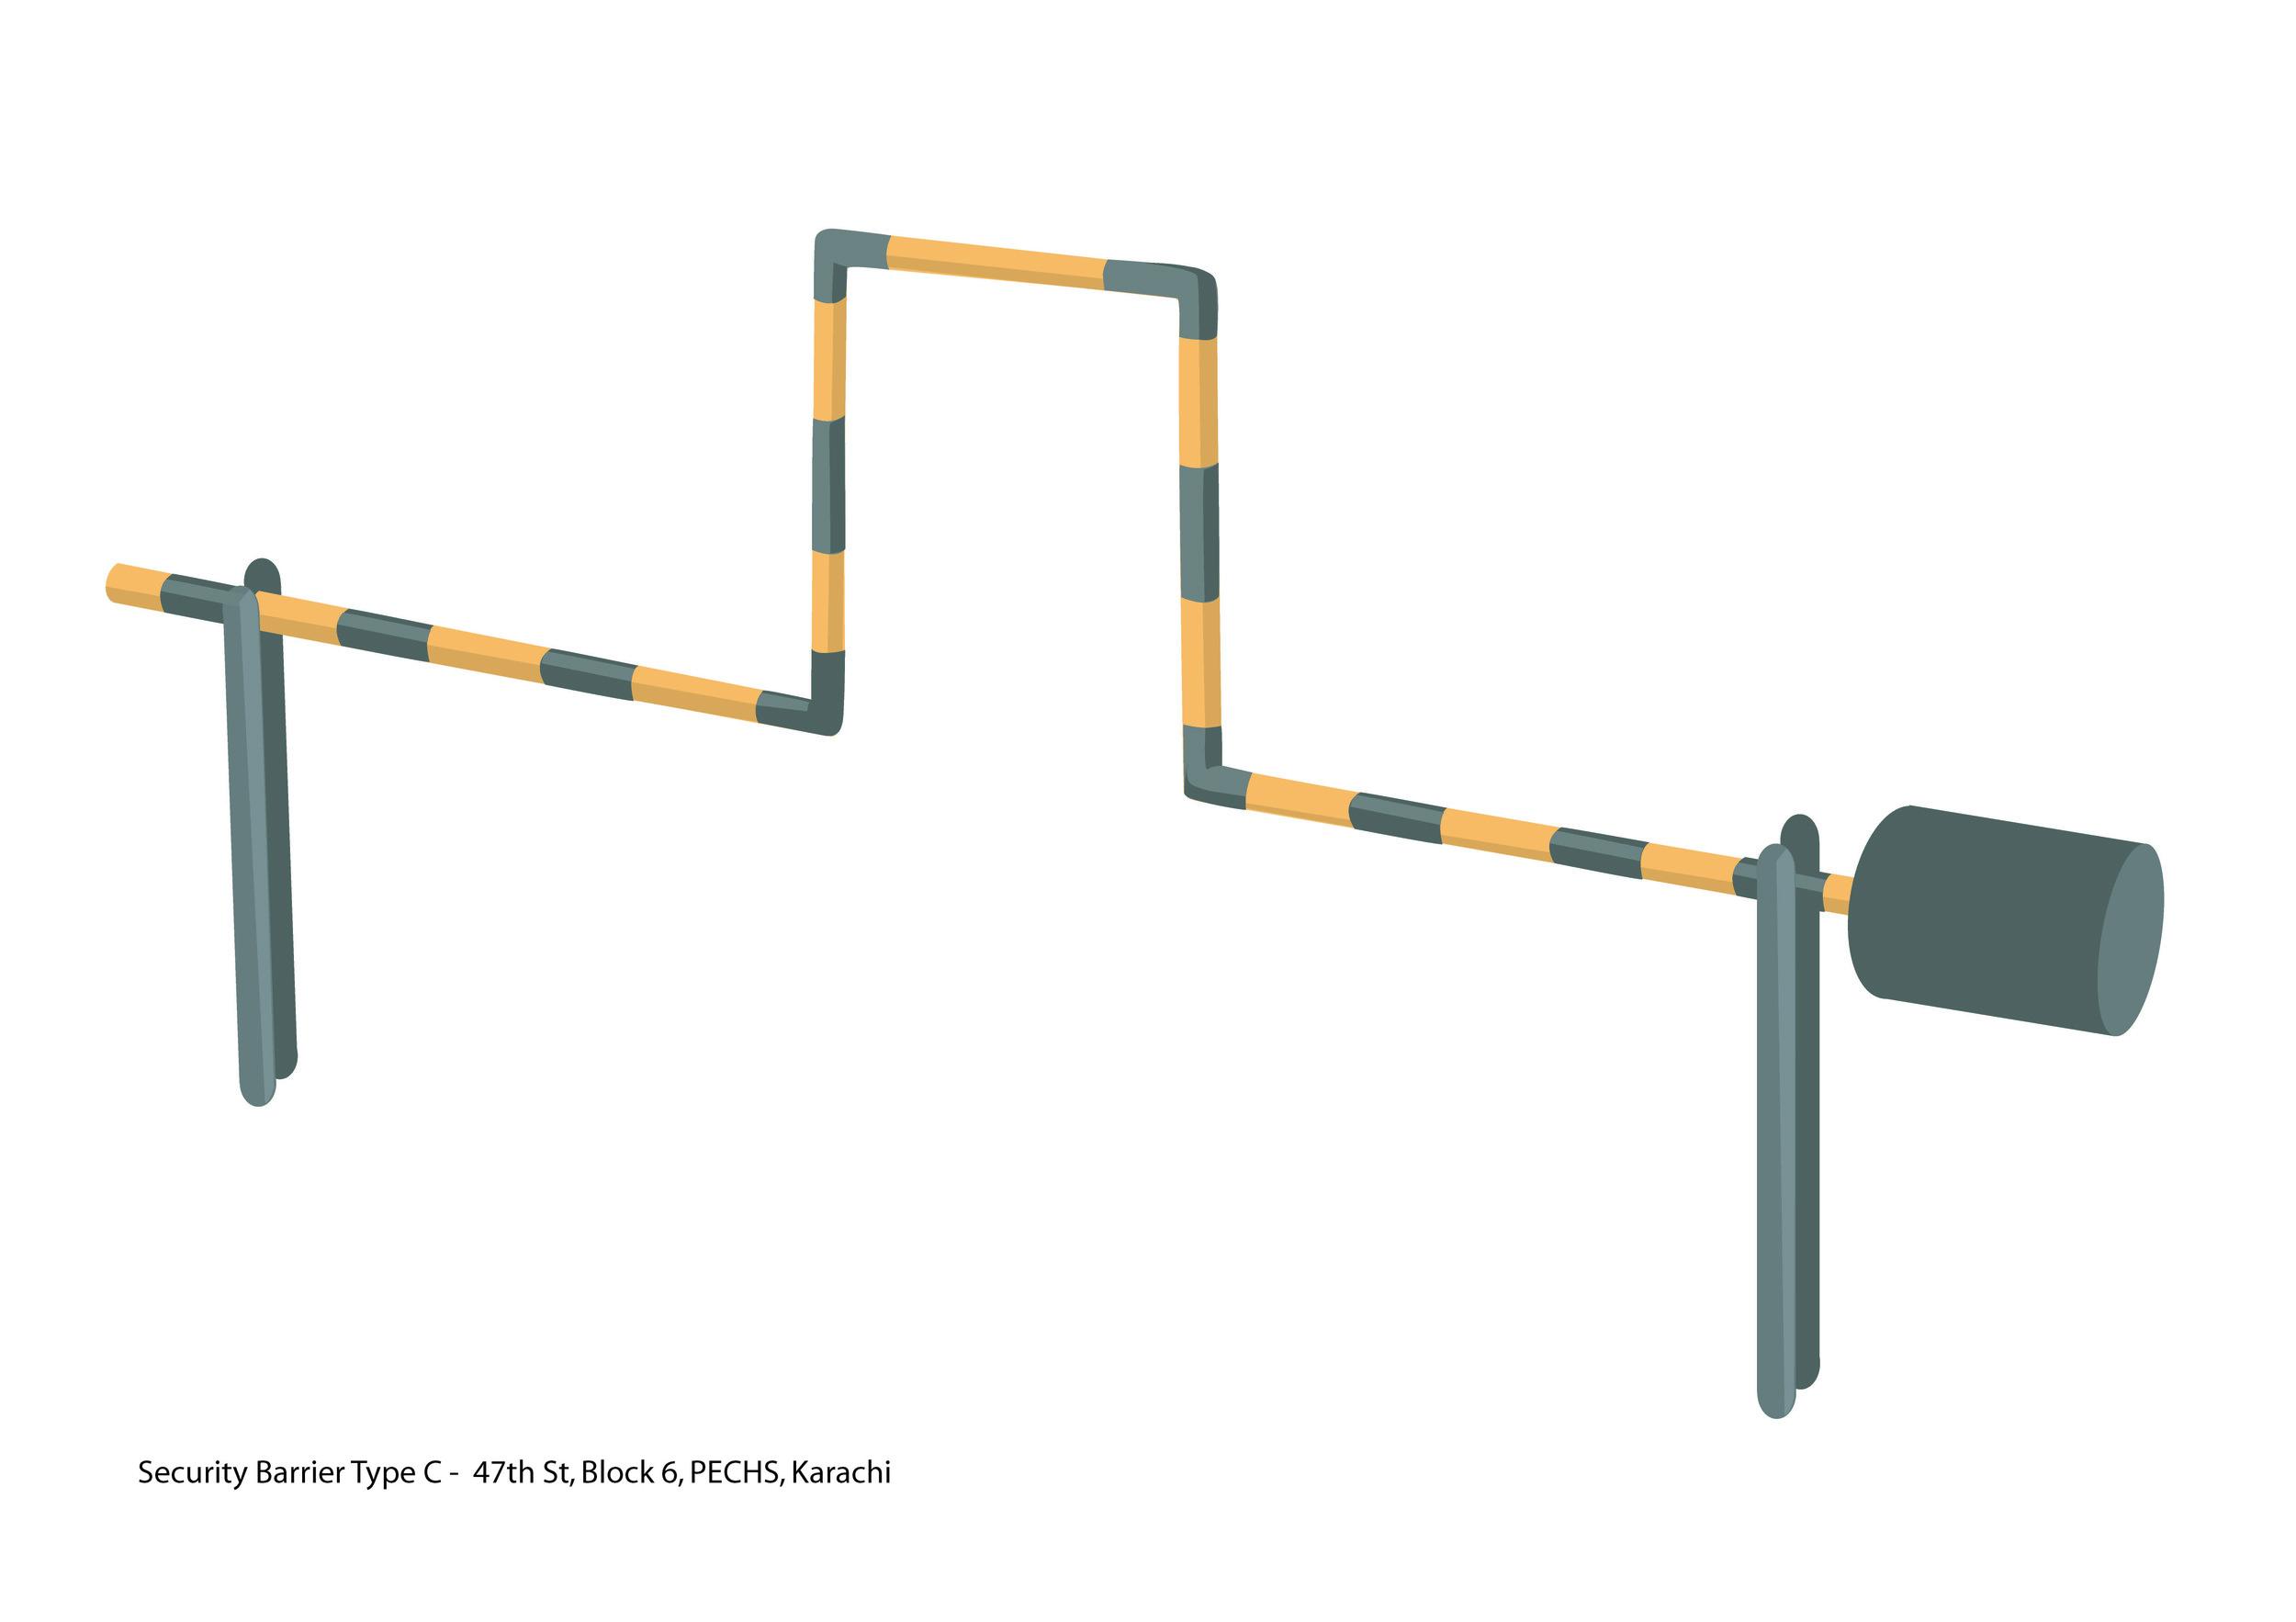 Security Barrier Type C